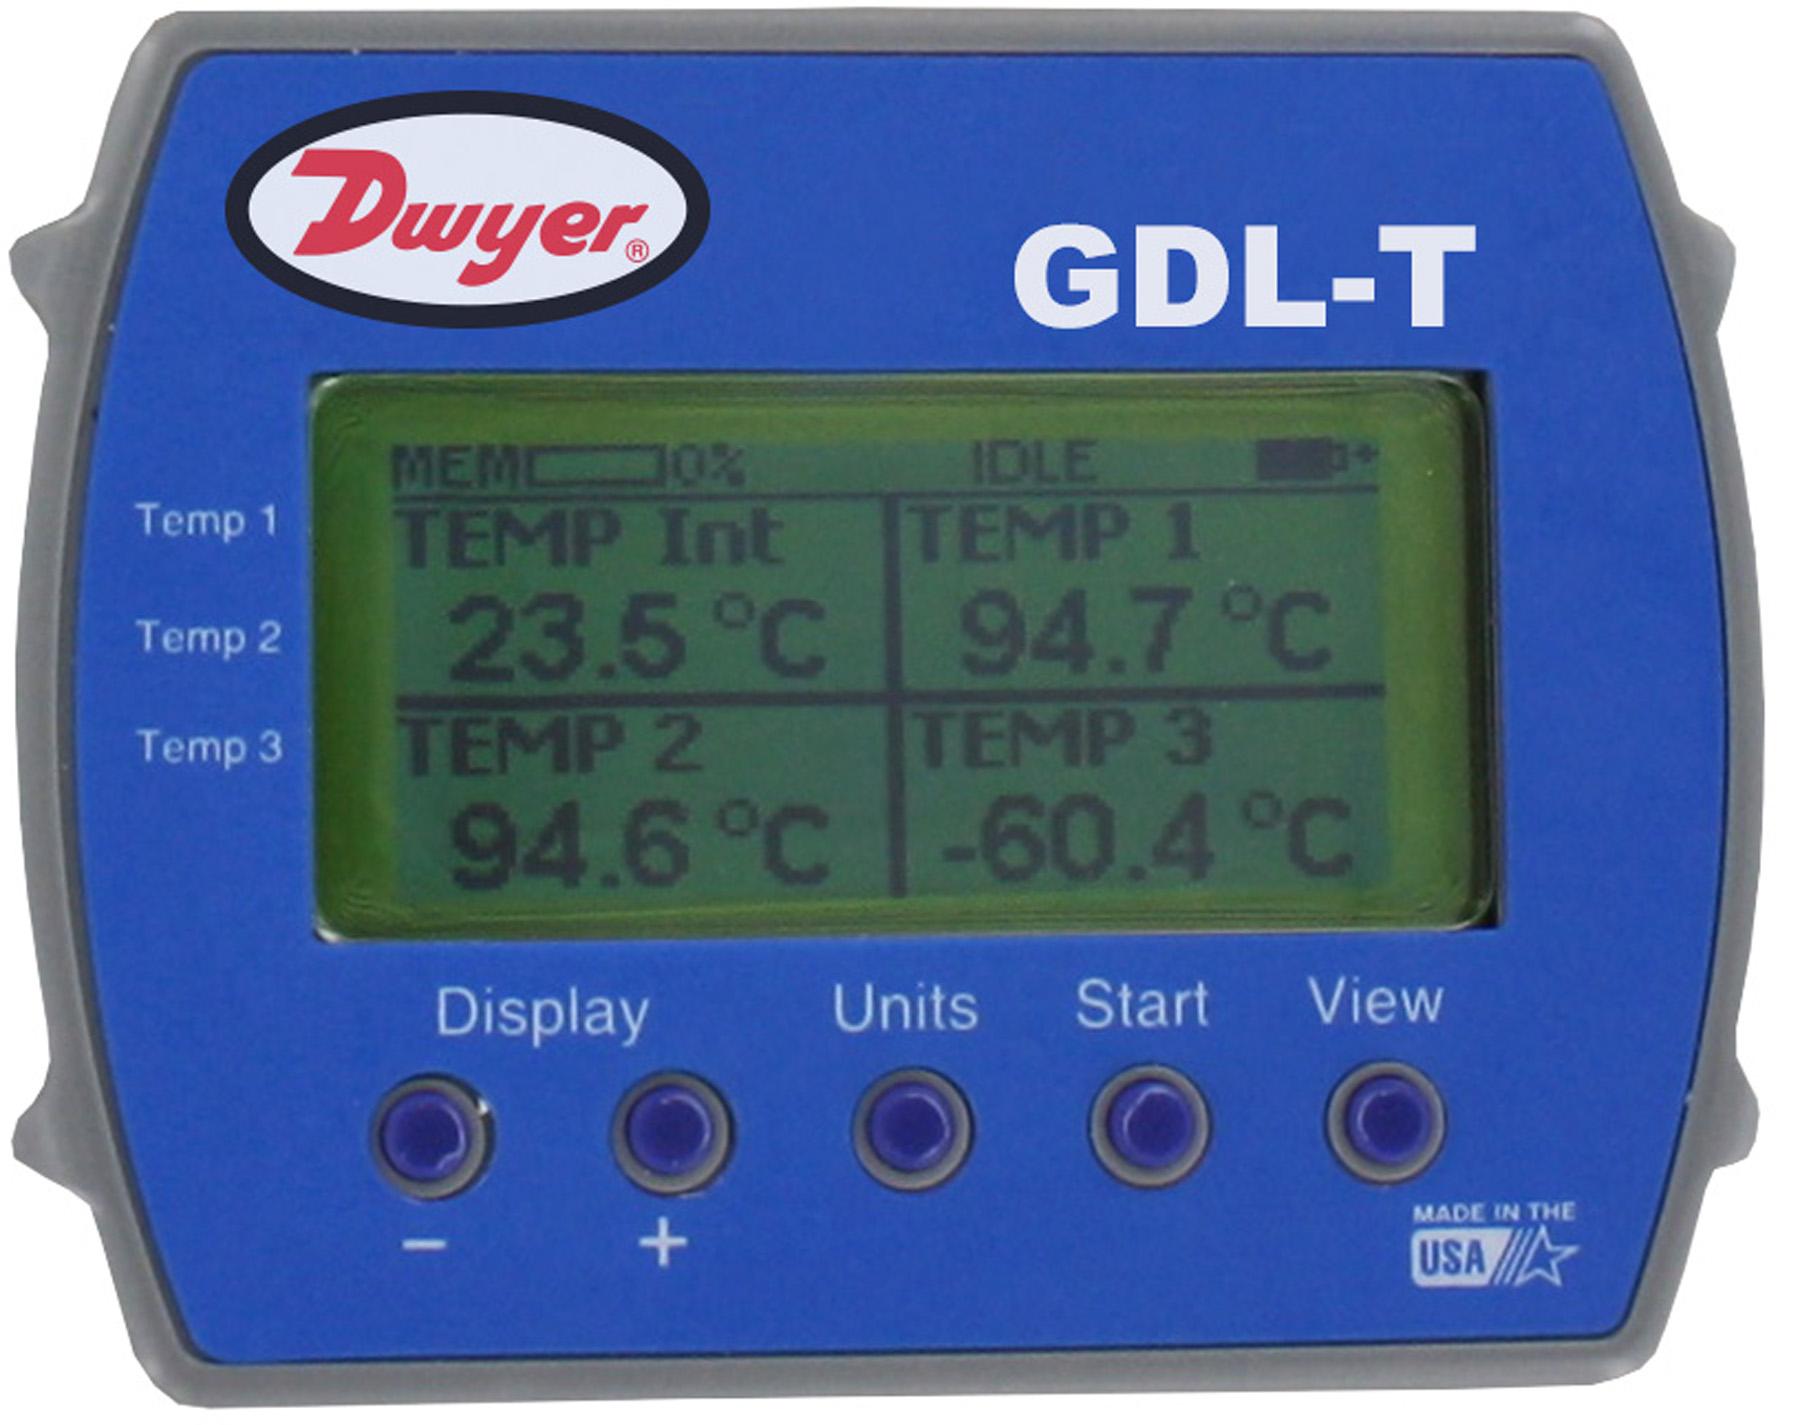 Dwyer GDL-T